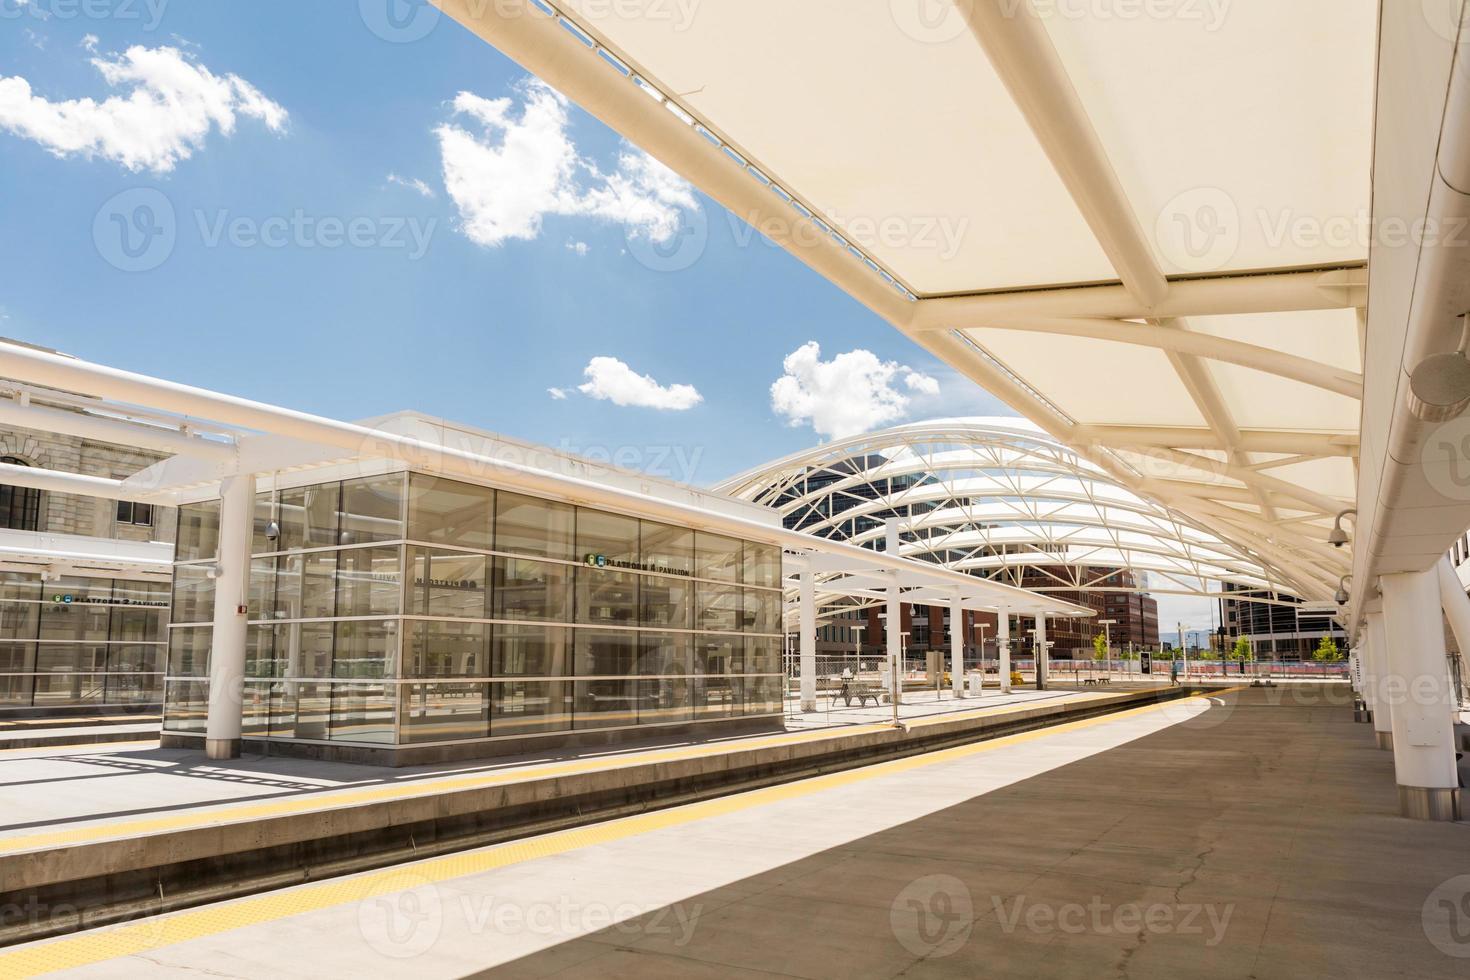 Union Station photo